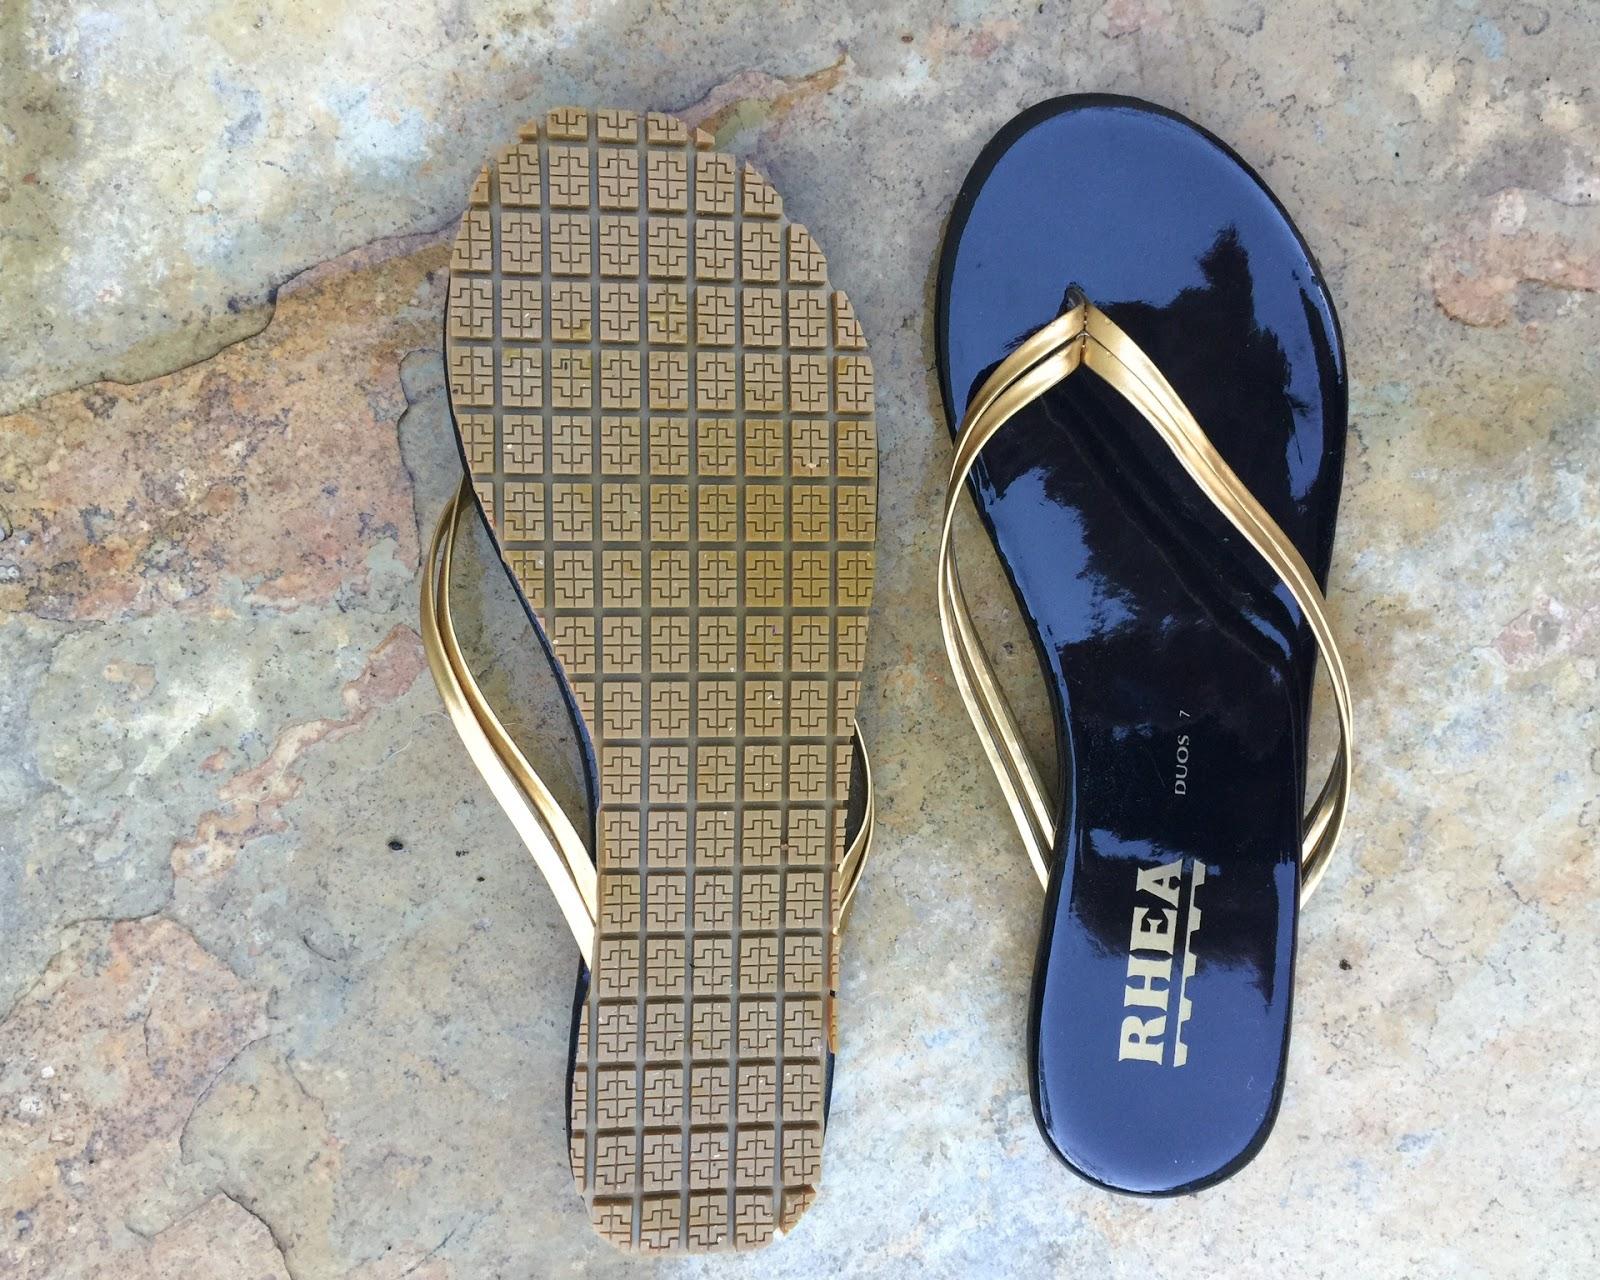 7f625054fd822 Rhea Non-Slip Sandals  Review   Giveaway! - Fashion Should Be Fun